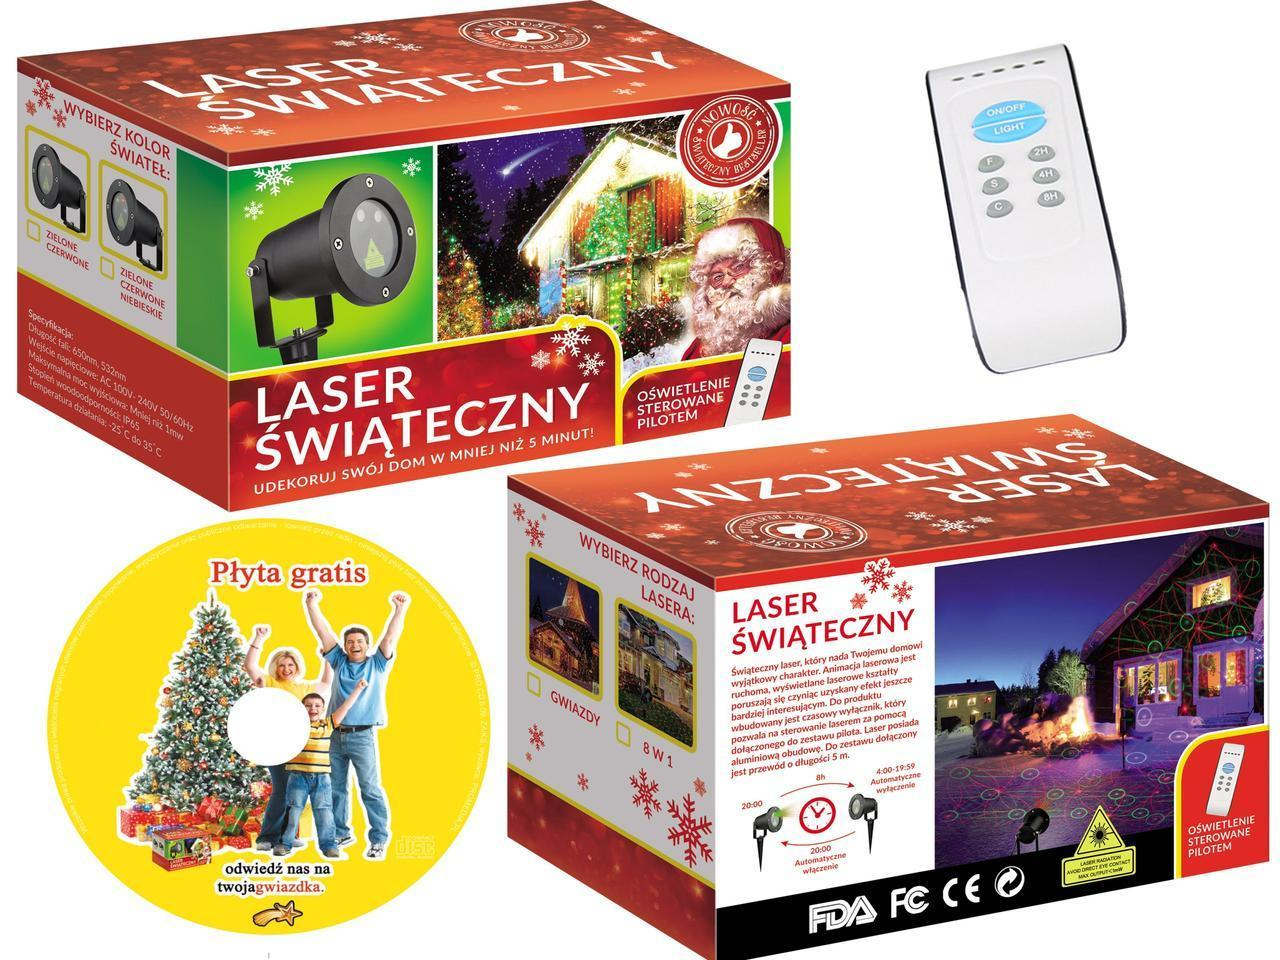 Лазерний проектор STAR SHOWER 2 кольори